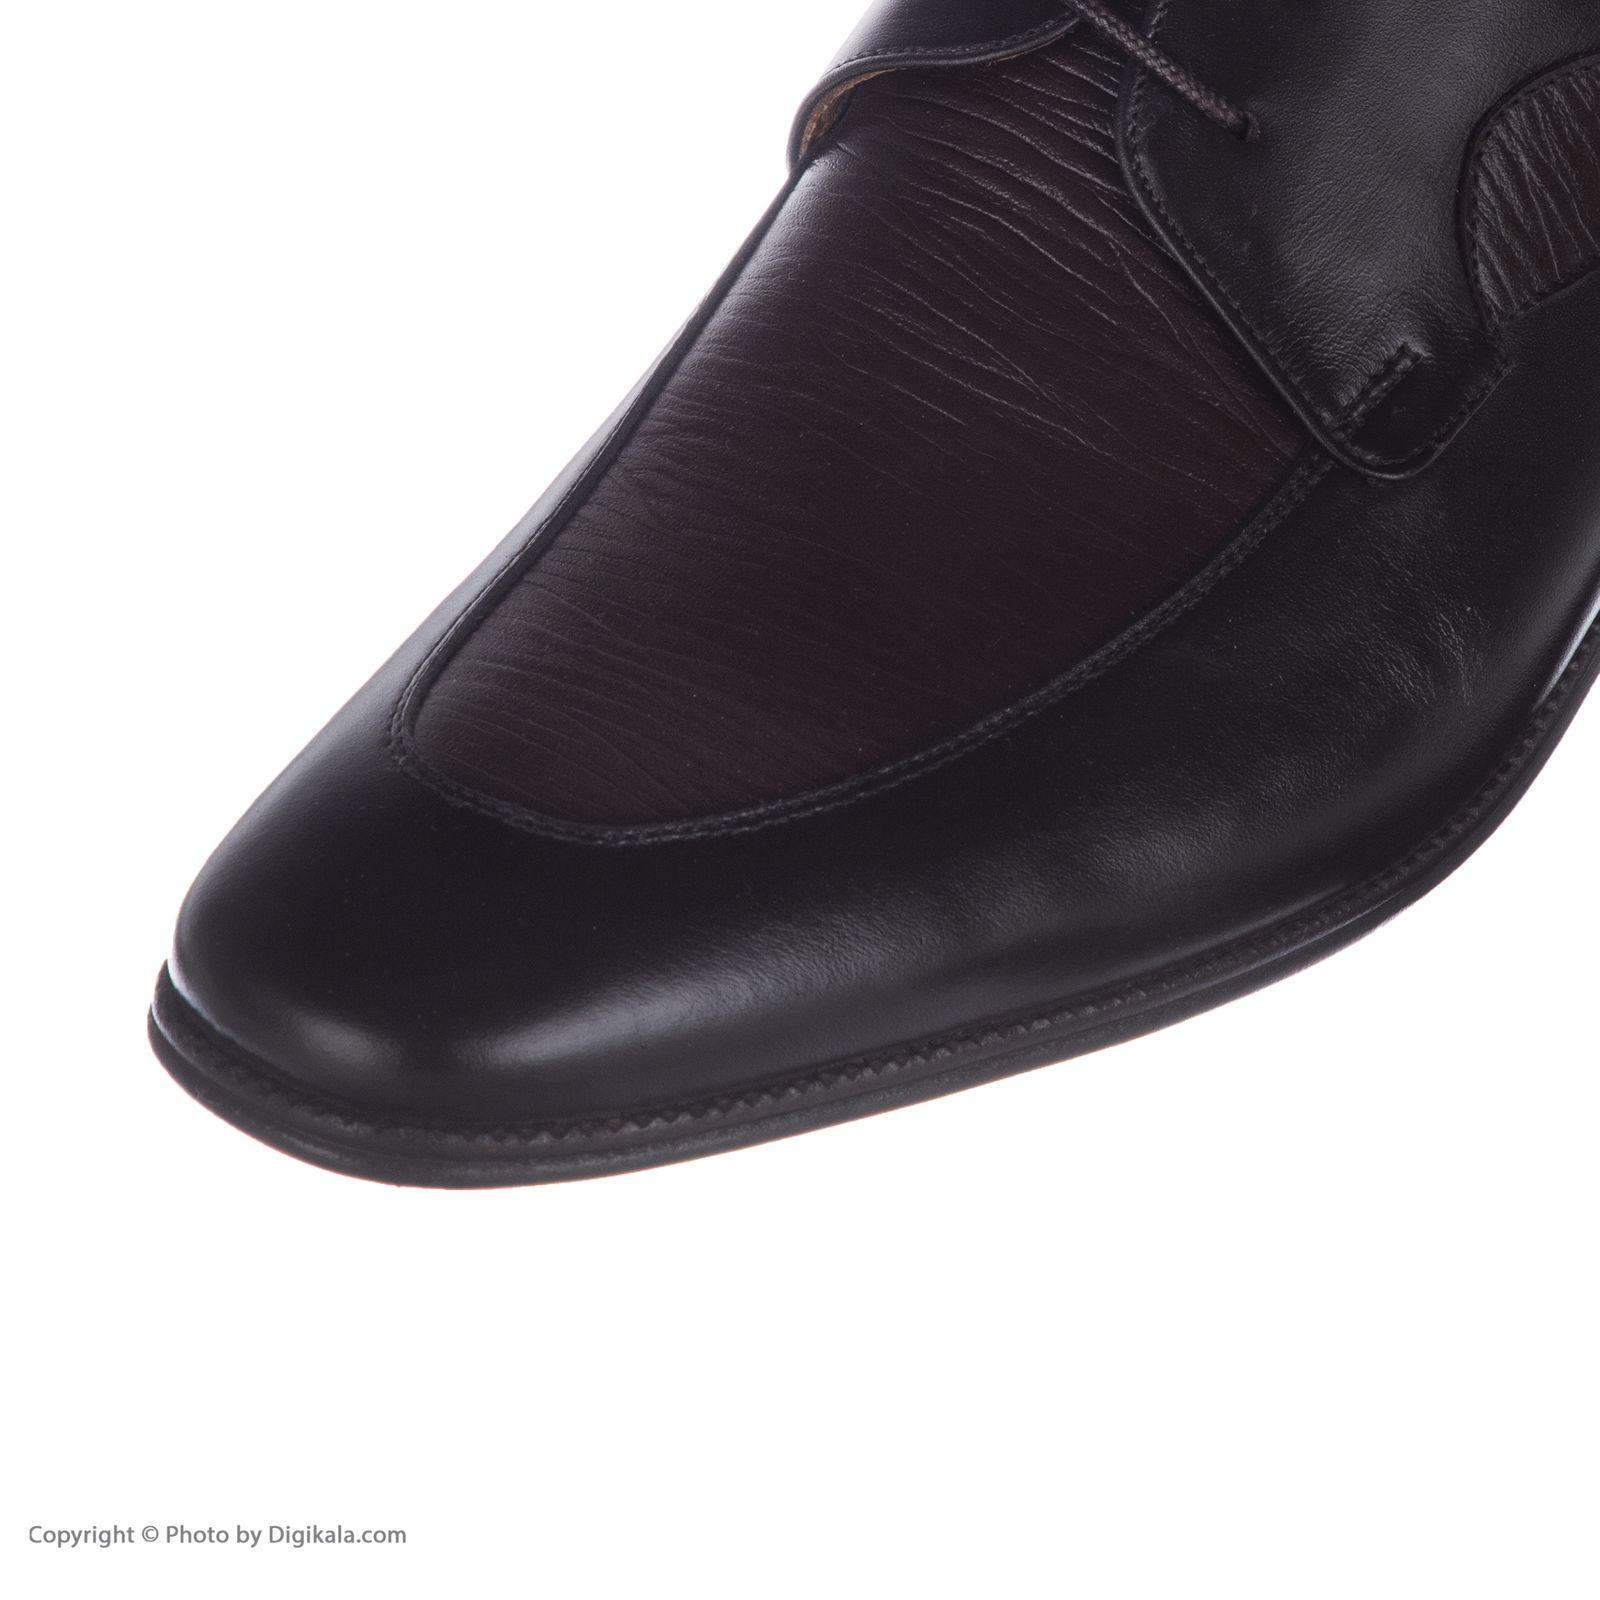 کفش مردانه نظری کد 429 -  - 6